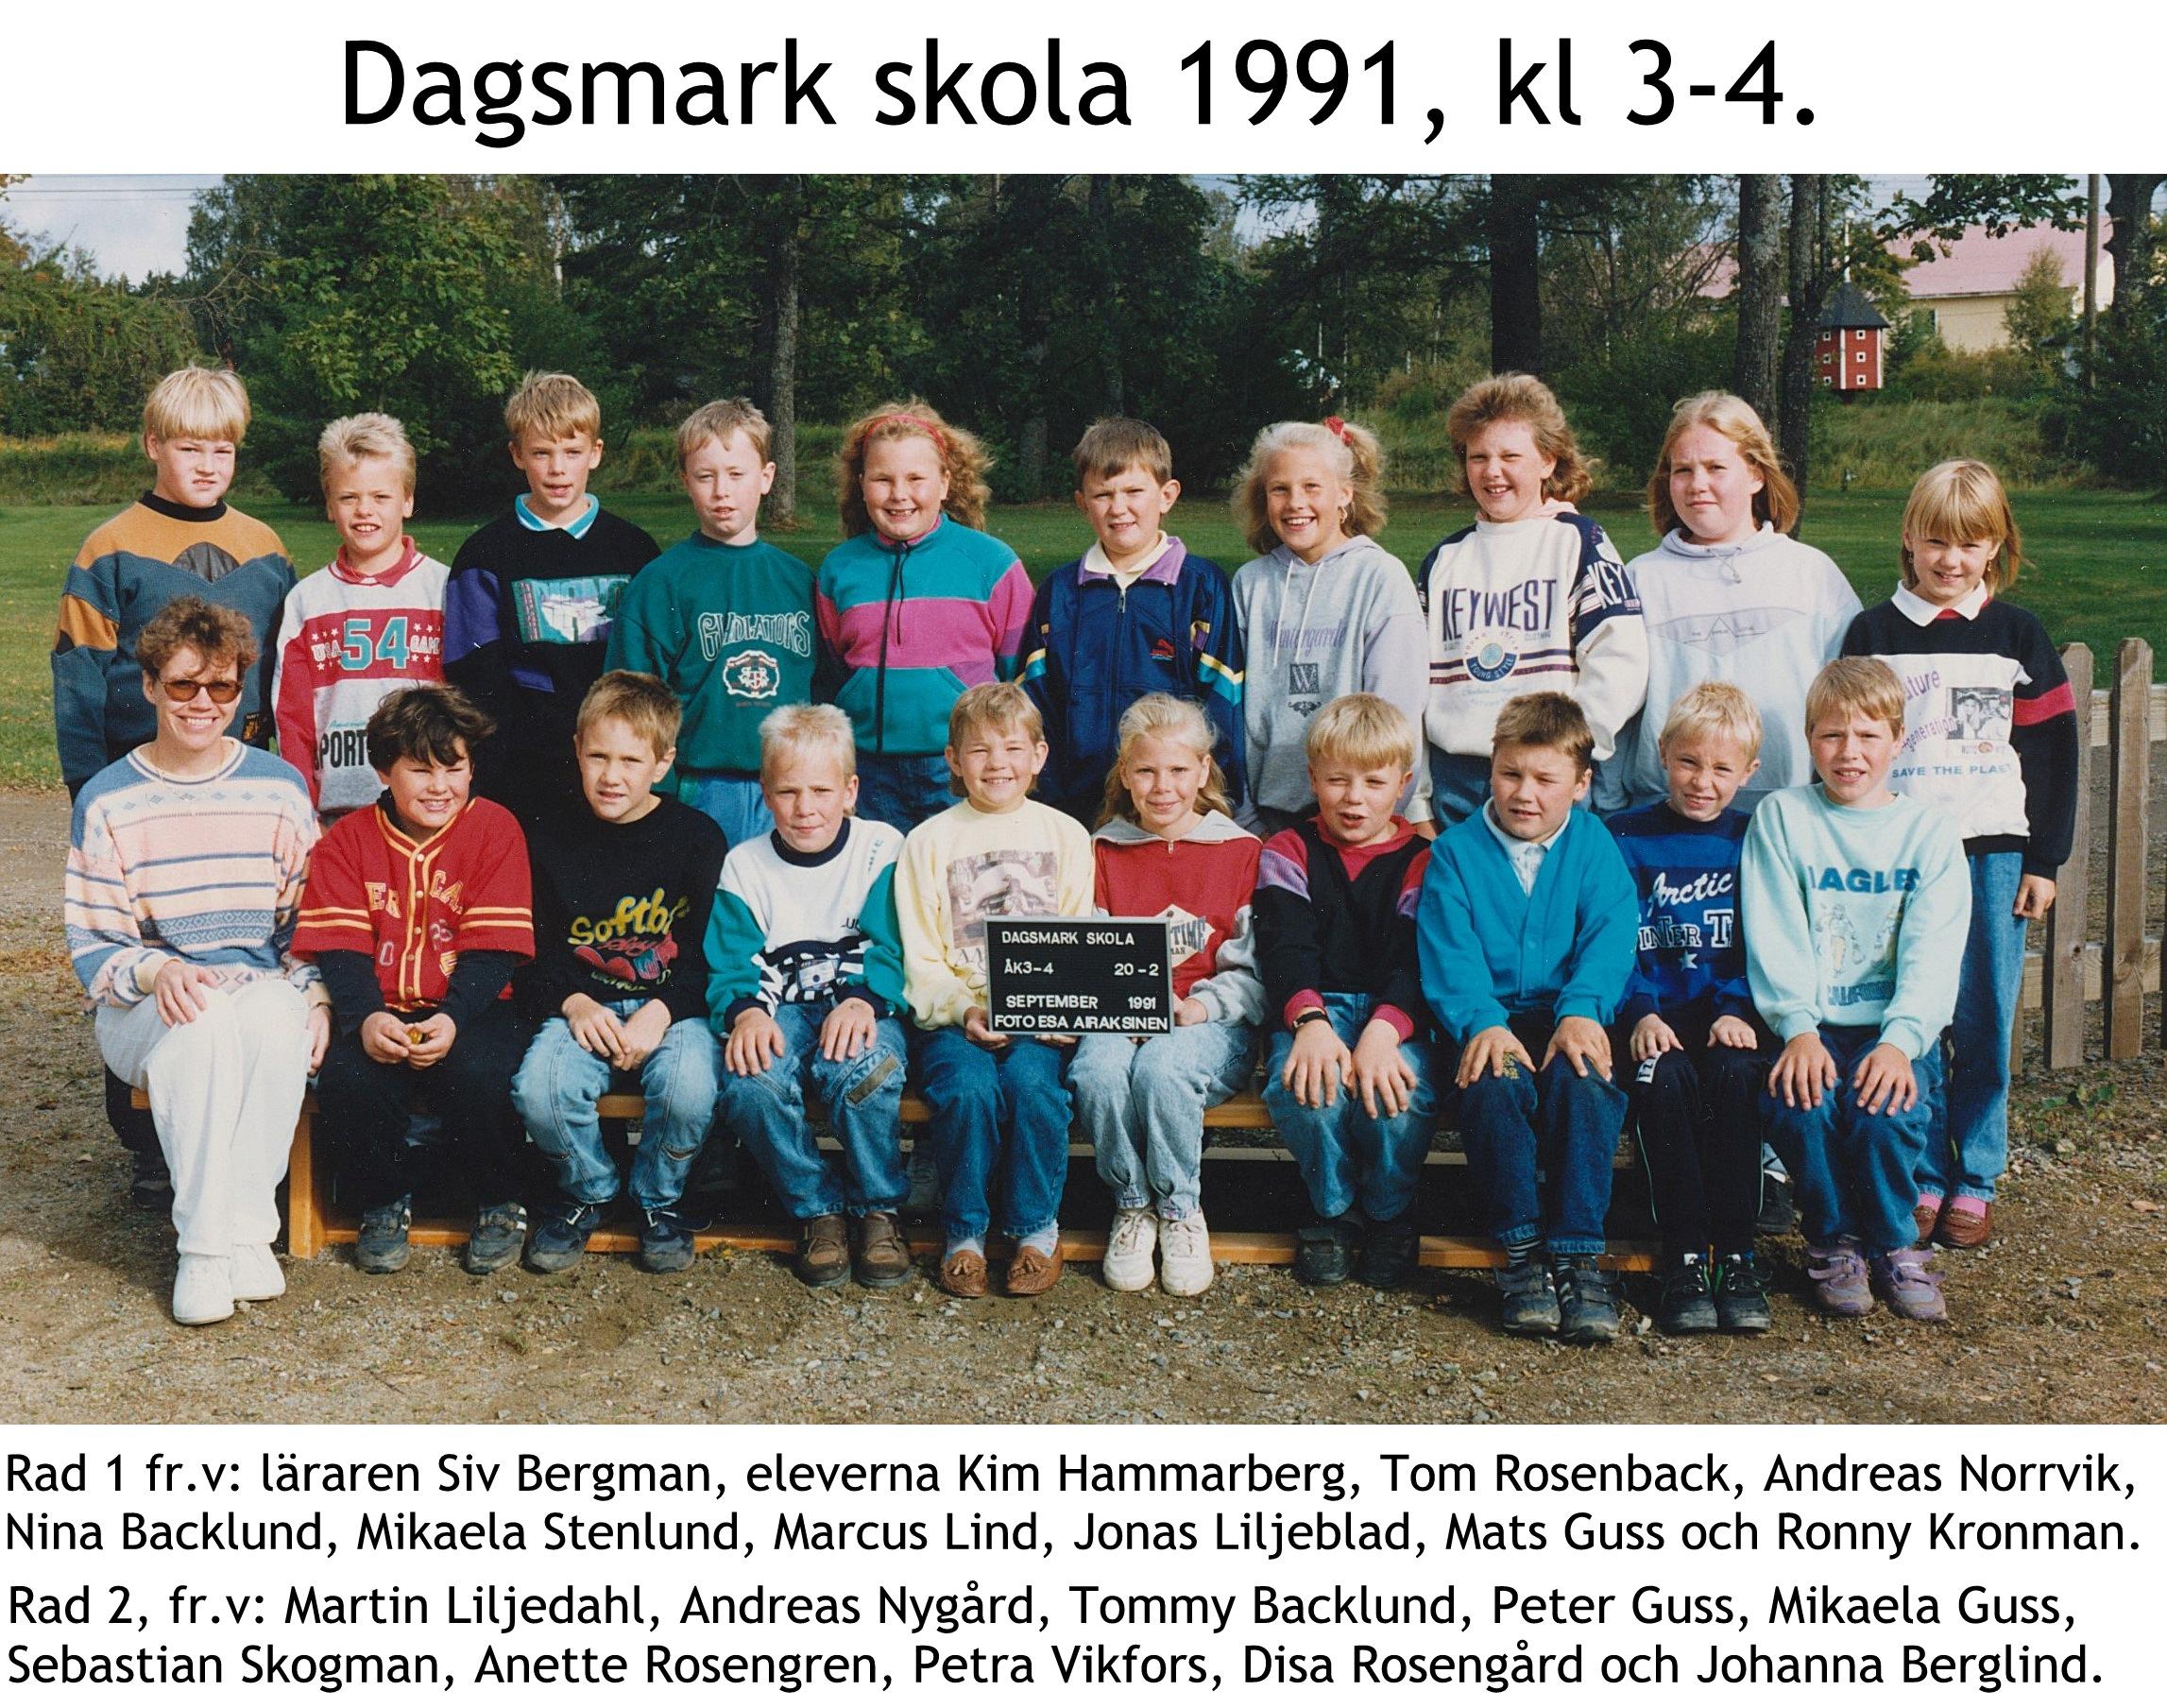 1991 Dagsmark skola kl 3-4